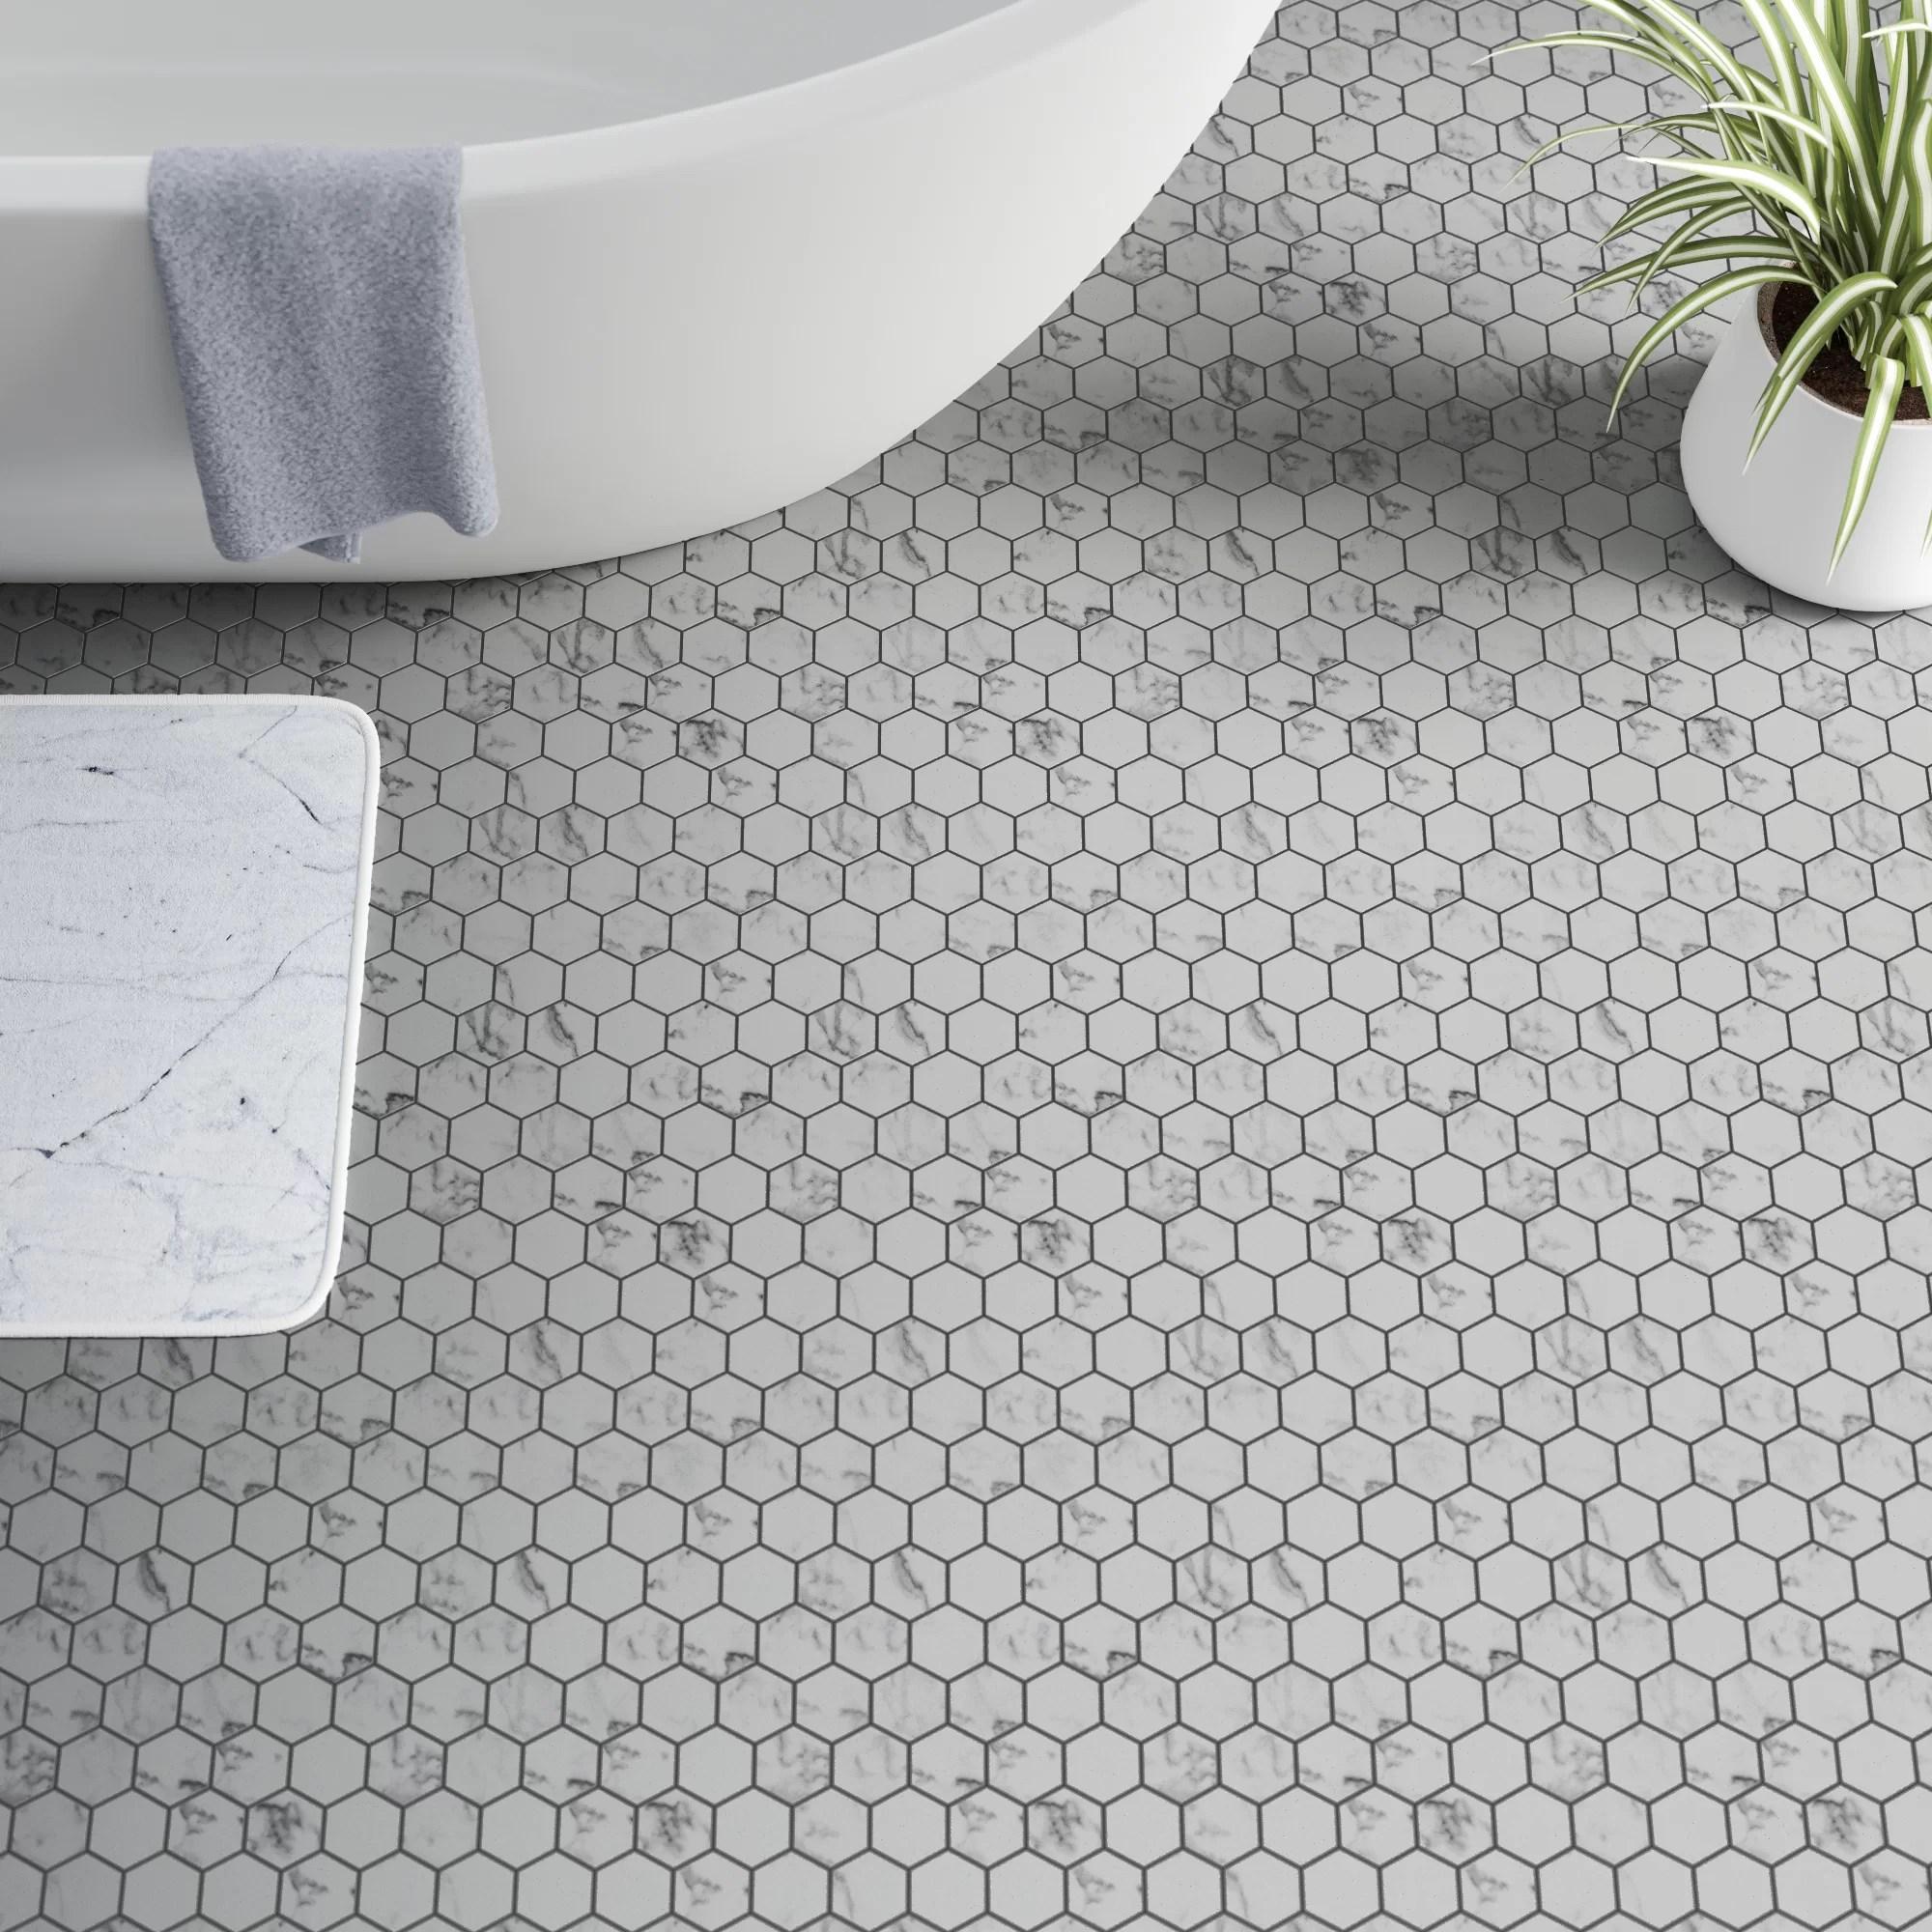 andrew 2 x 2 hexagon porcelain mosaic tile